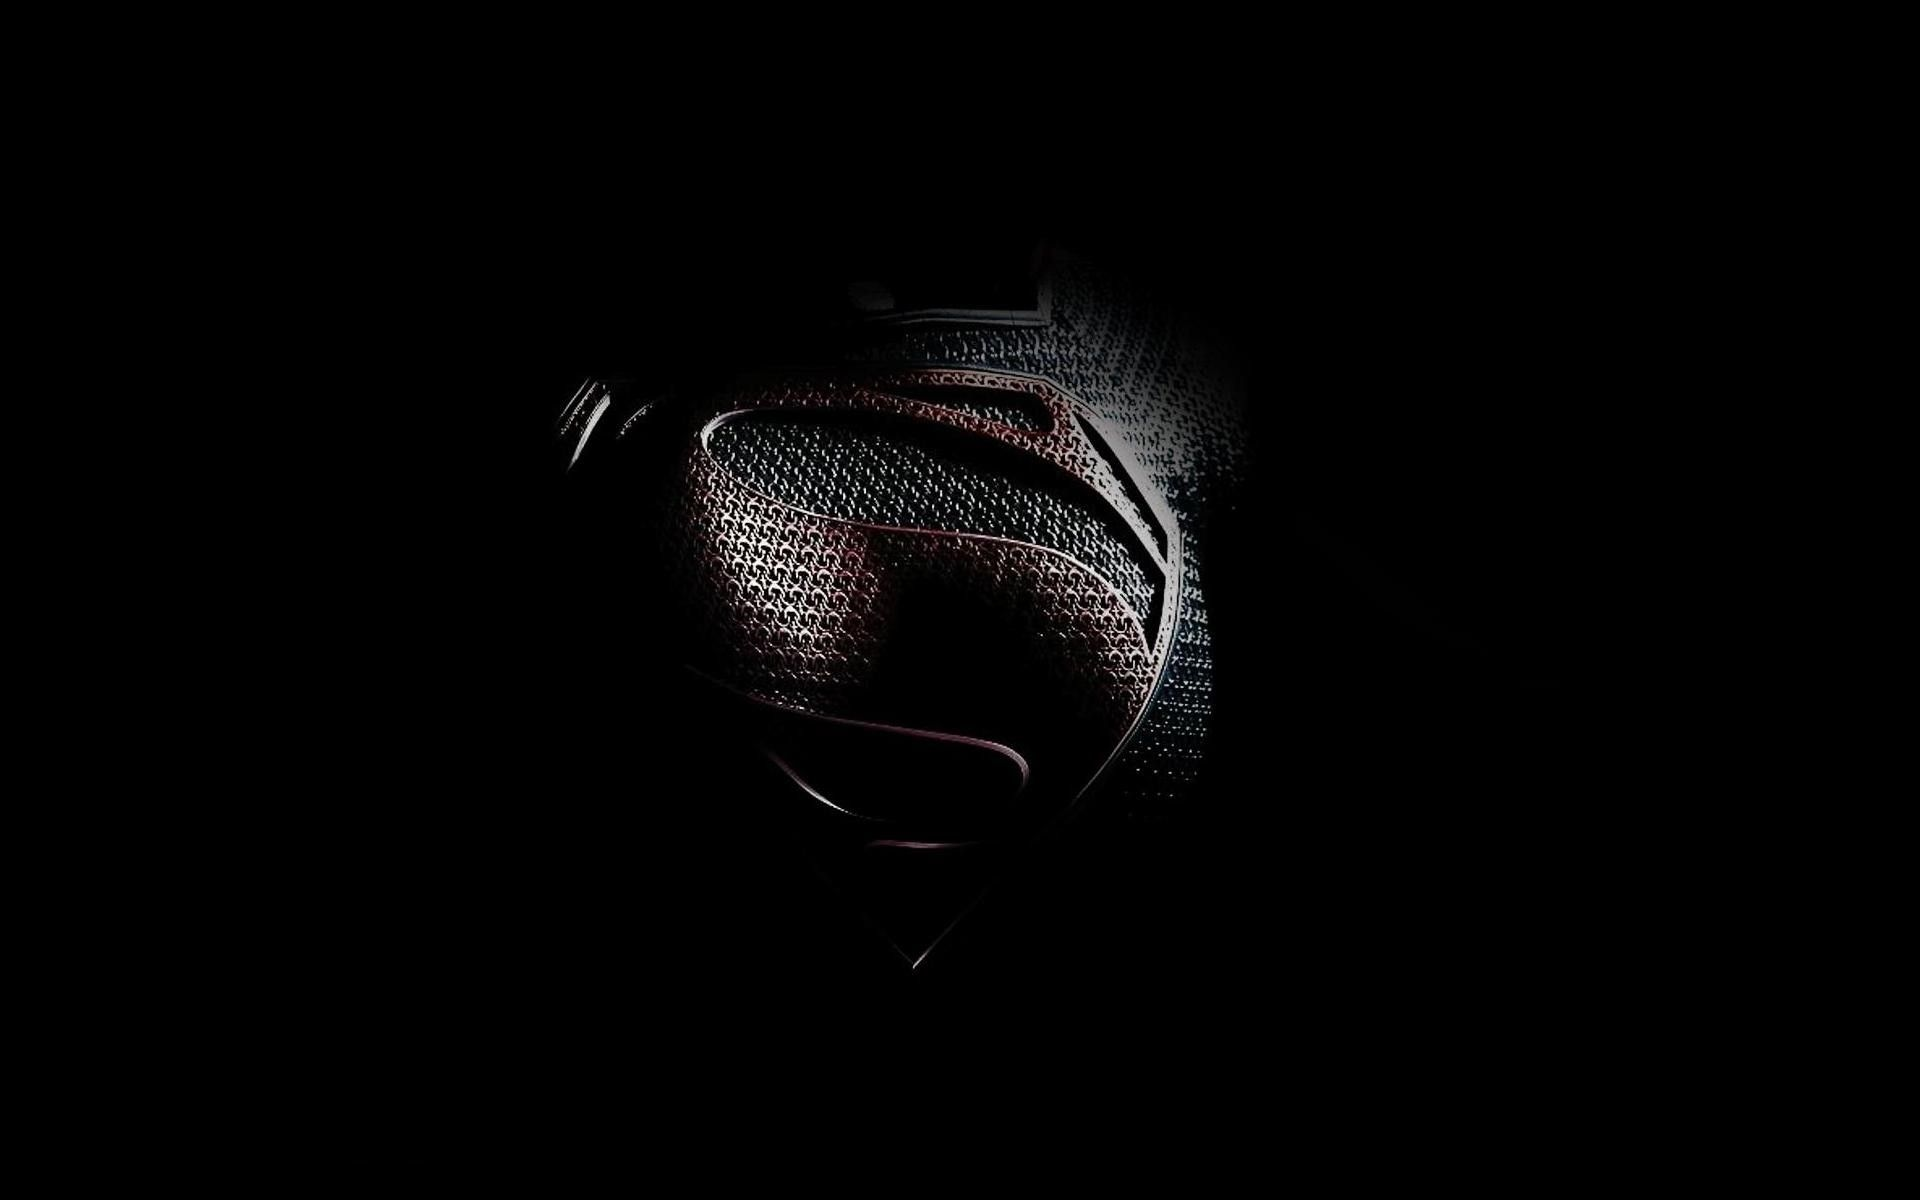 Black Superman Wallpapers Black Wallpaper Android Wallpaper Black Black Hd Wallpaper